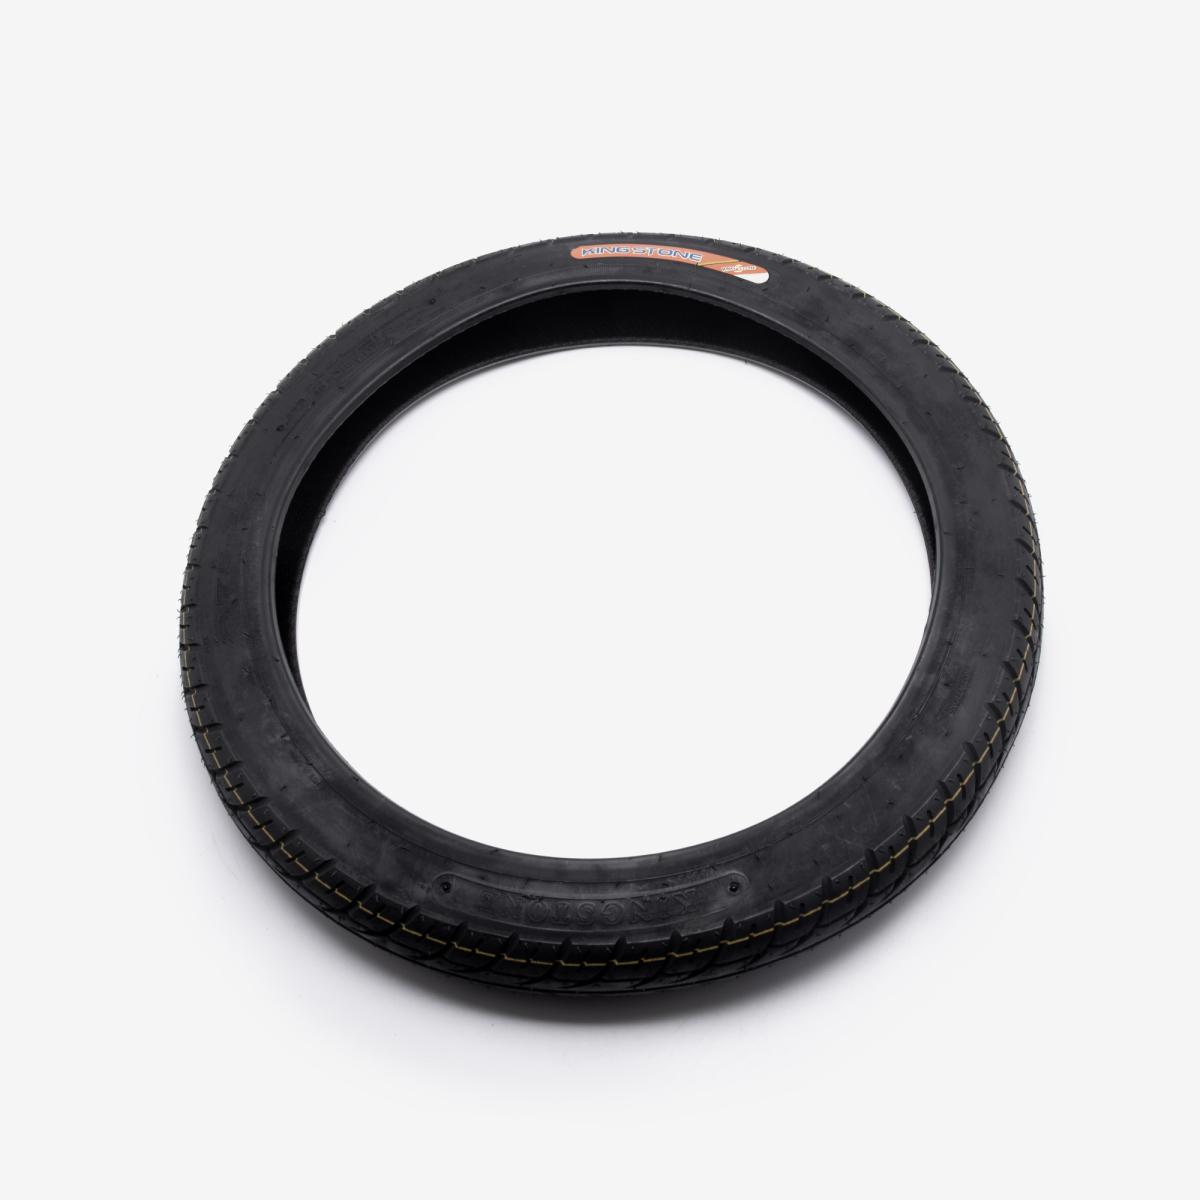 #27518 RT27518B Motorcycle Tyre 2.75-18 P Tubed